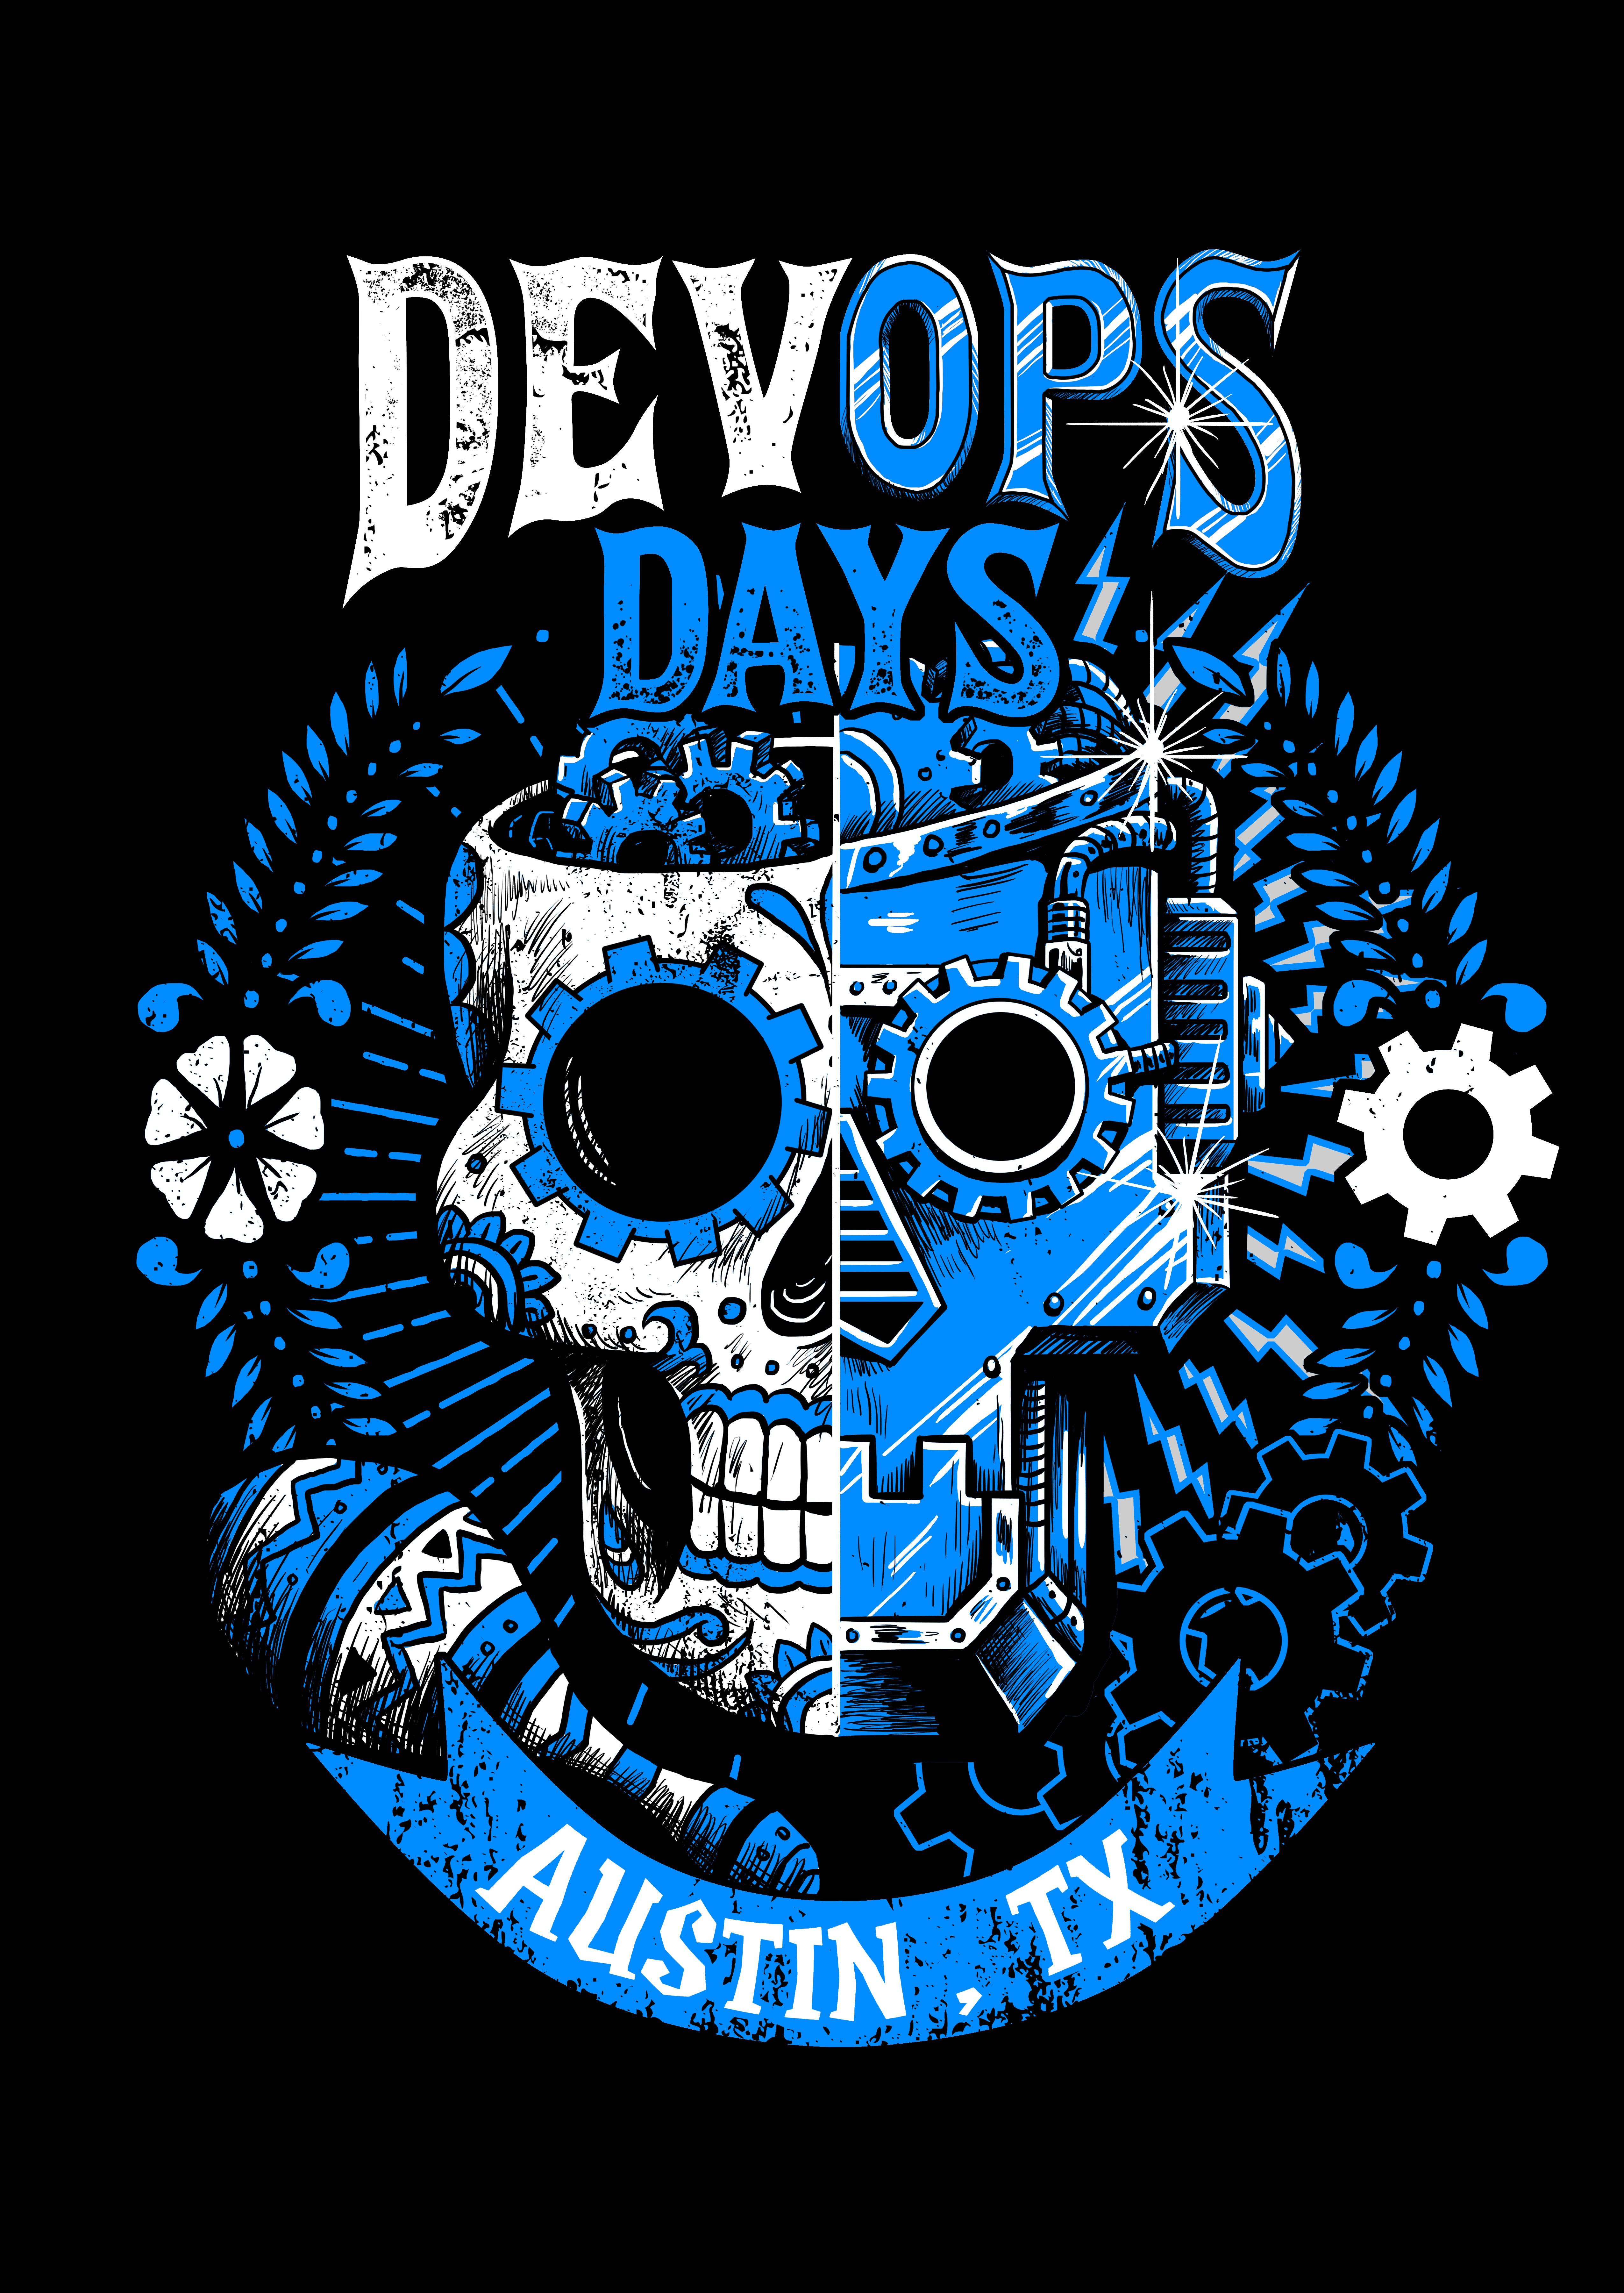 Robots, Calaveras collaborating for Devopsdays Austin